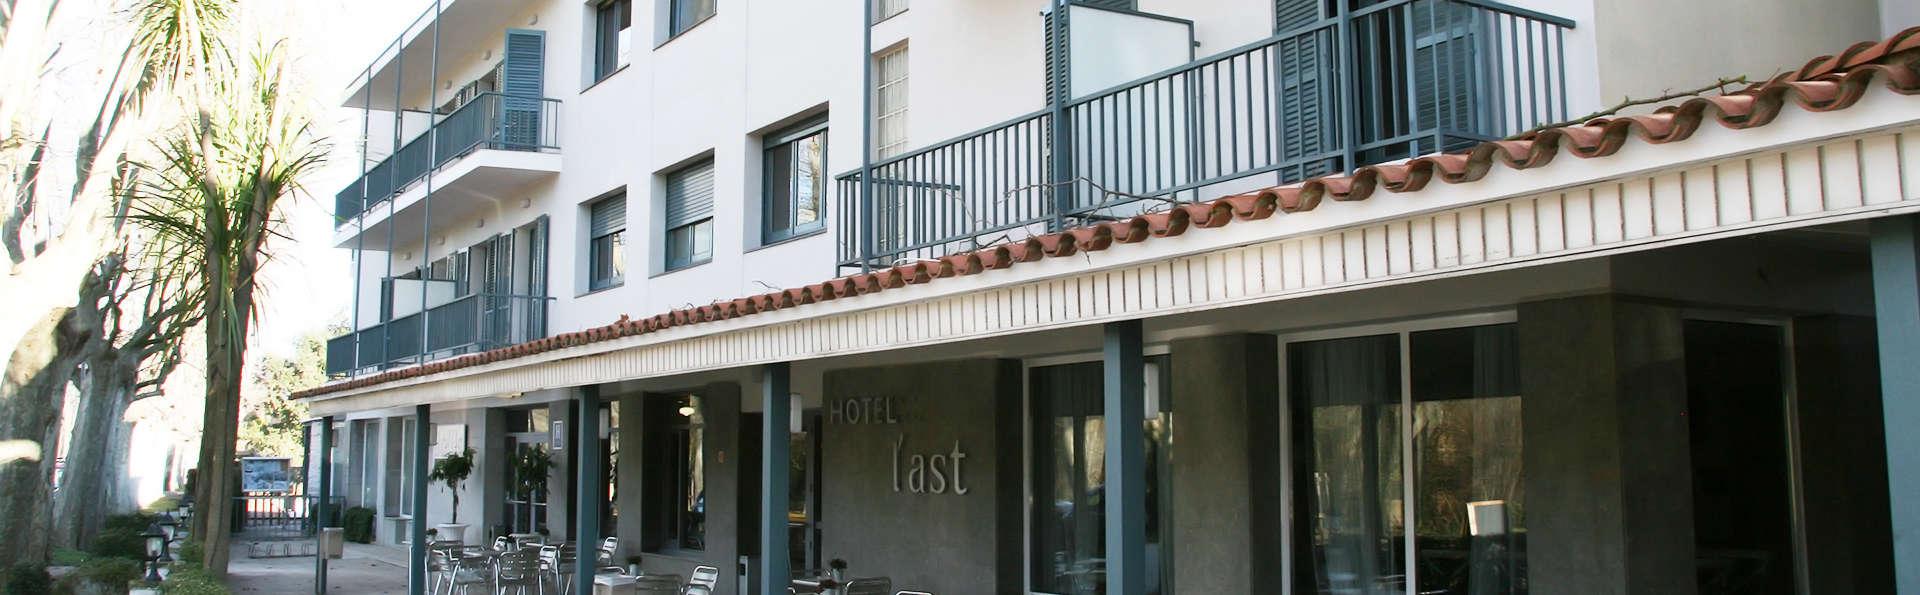 Hotel L'Ast - edit_front32.jpg